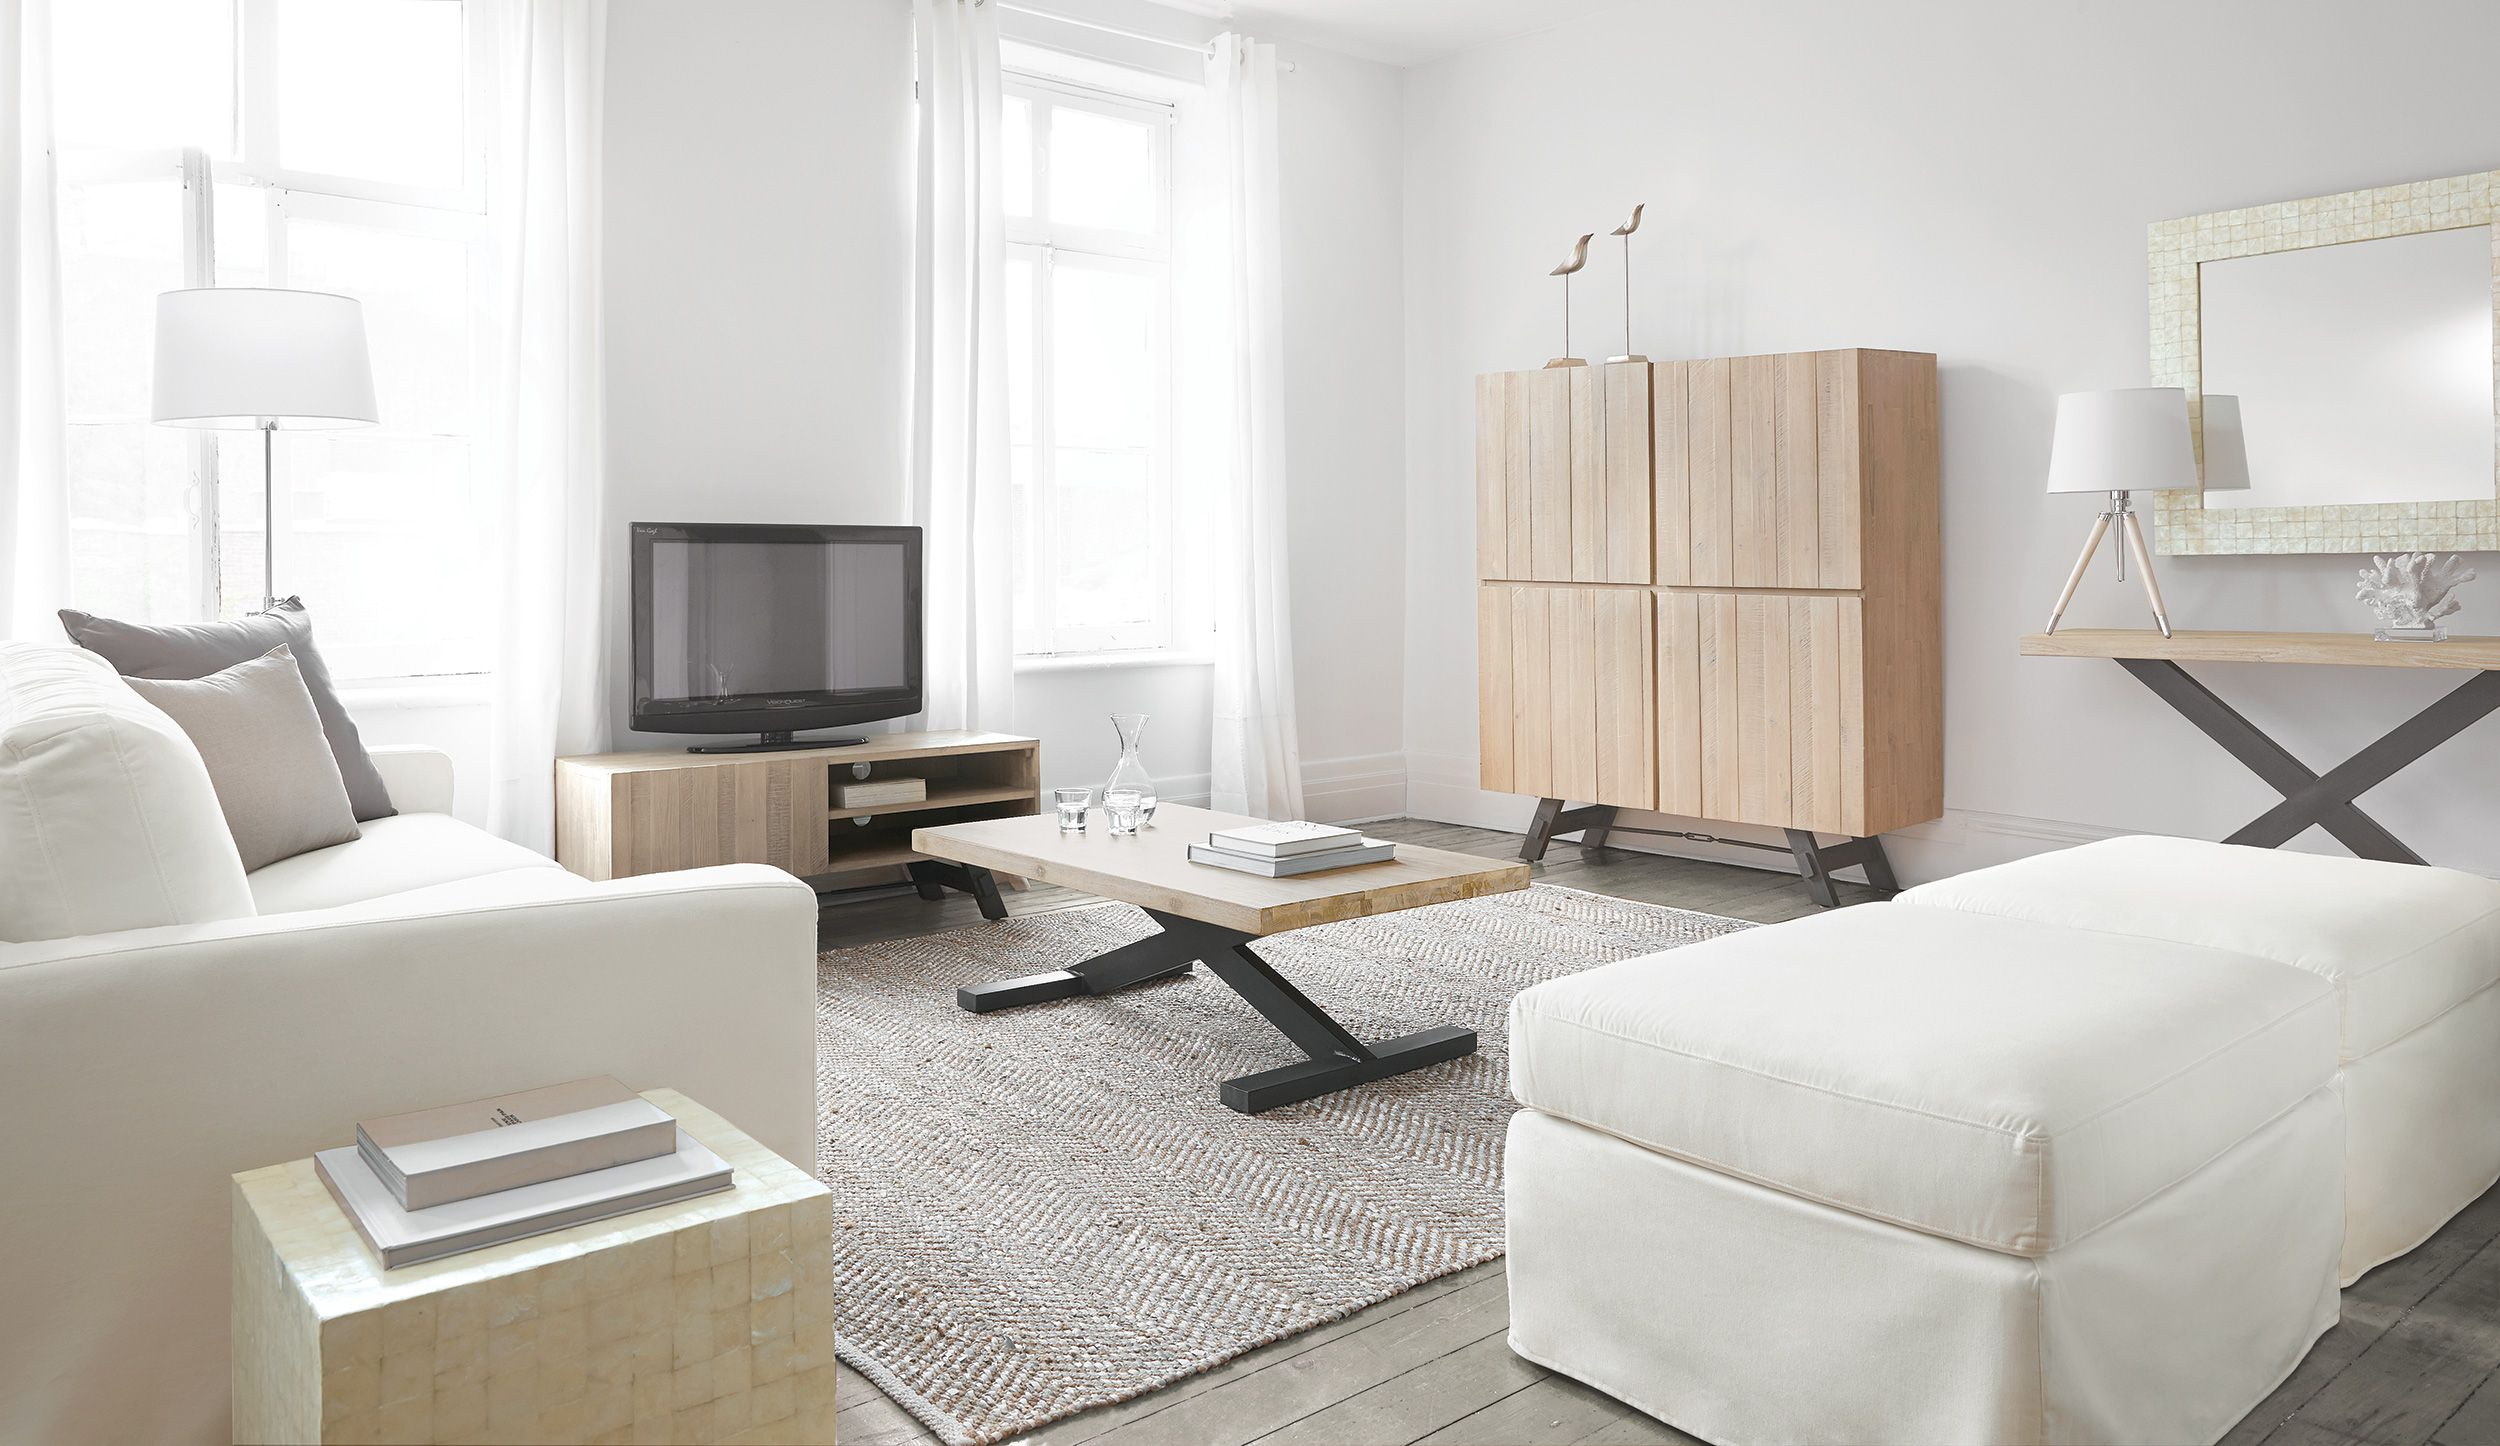 funky sofas nz clean sofa cushions urine hampton chic living room decor